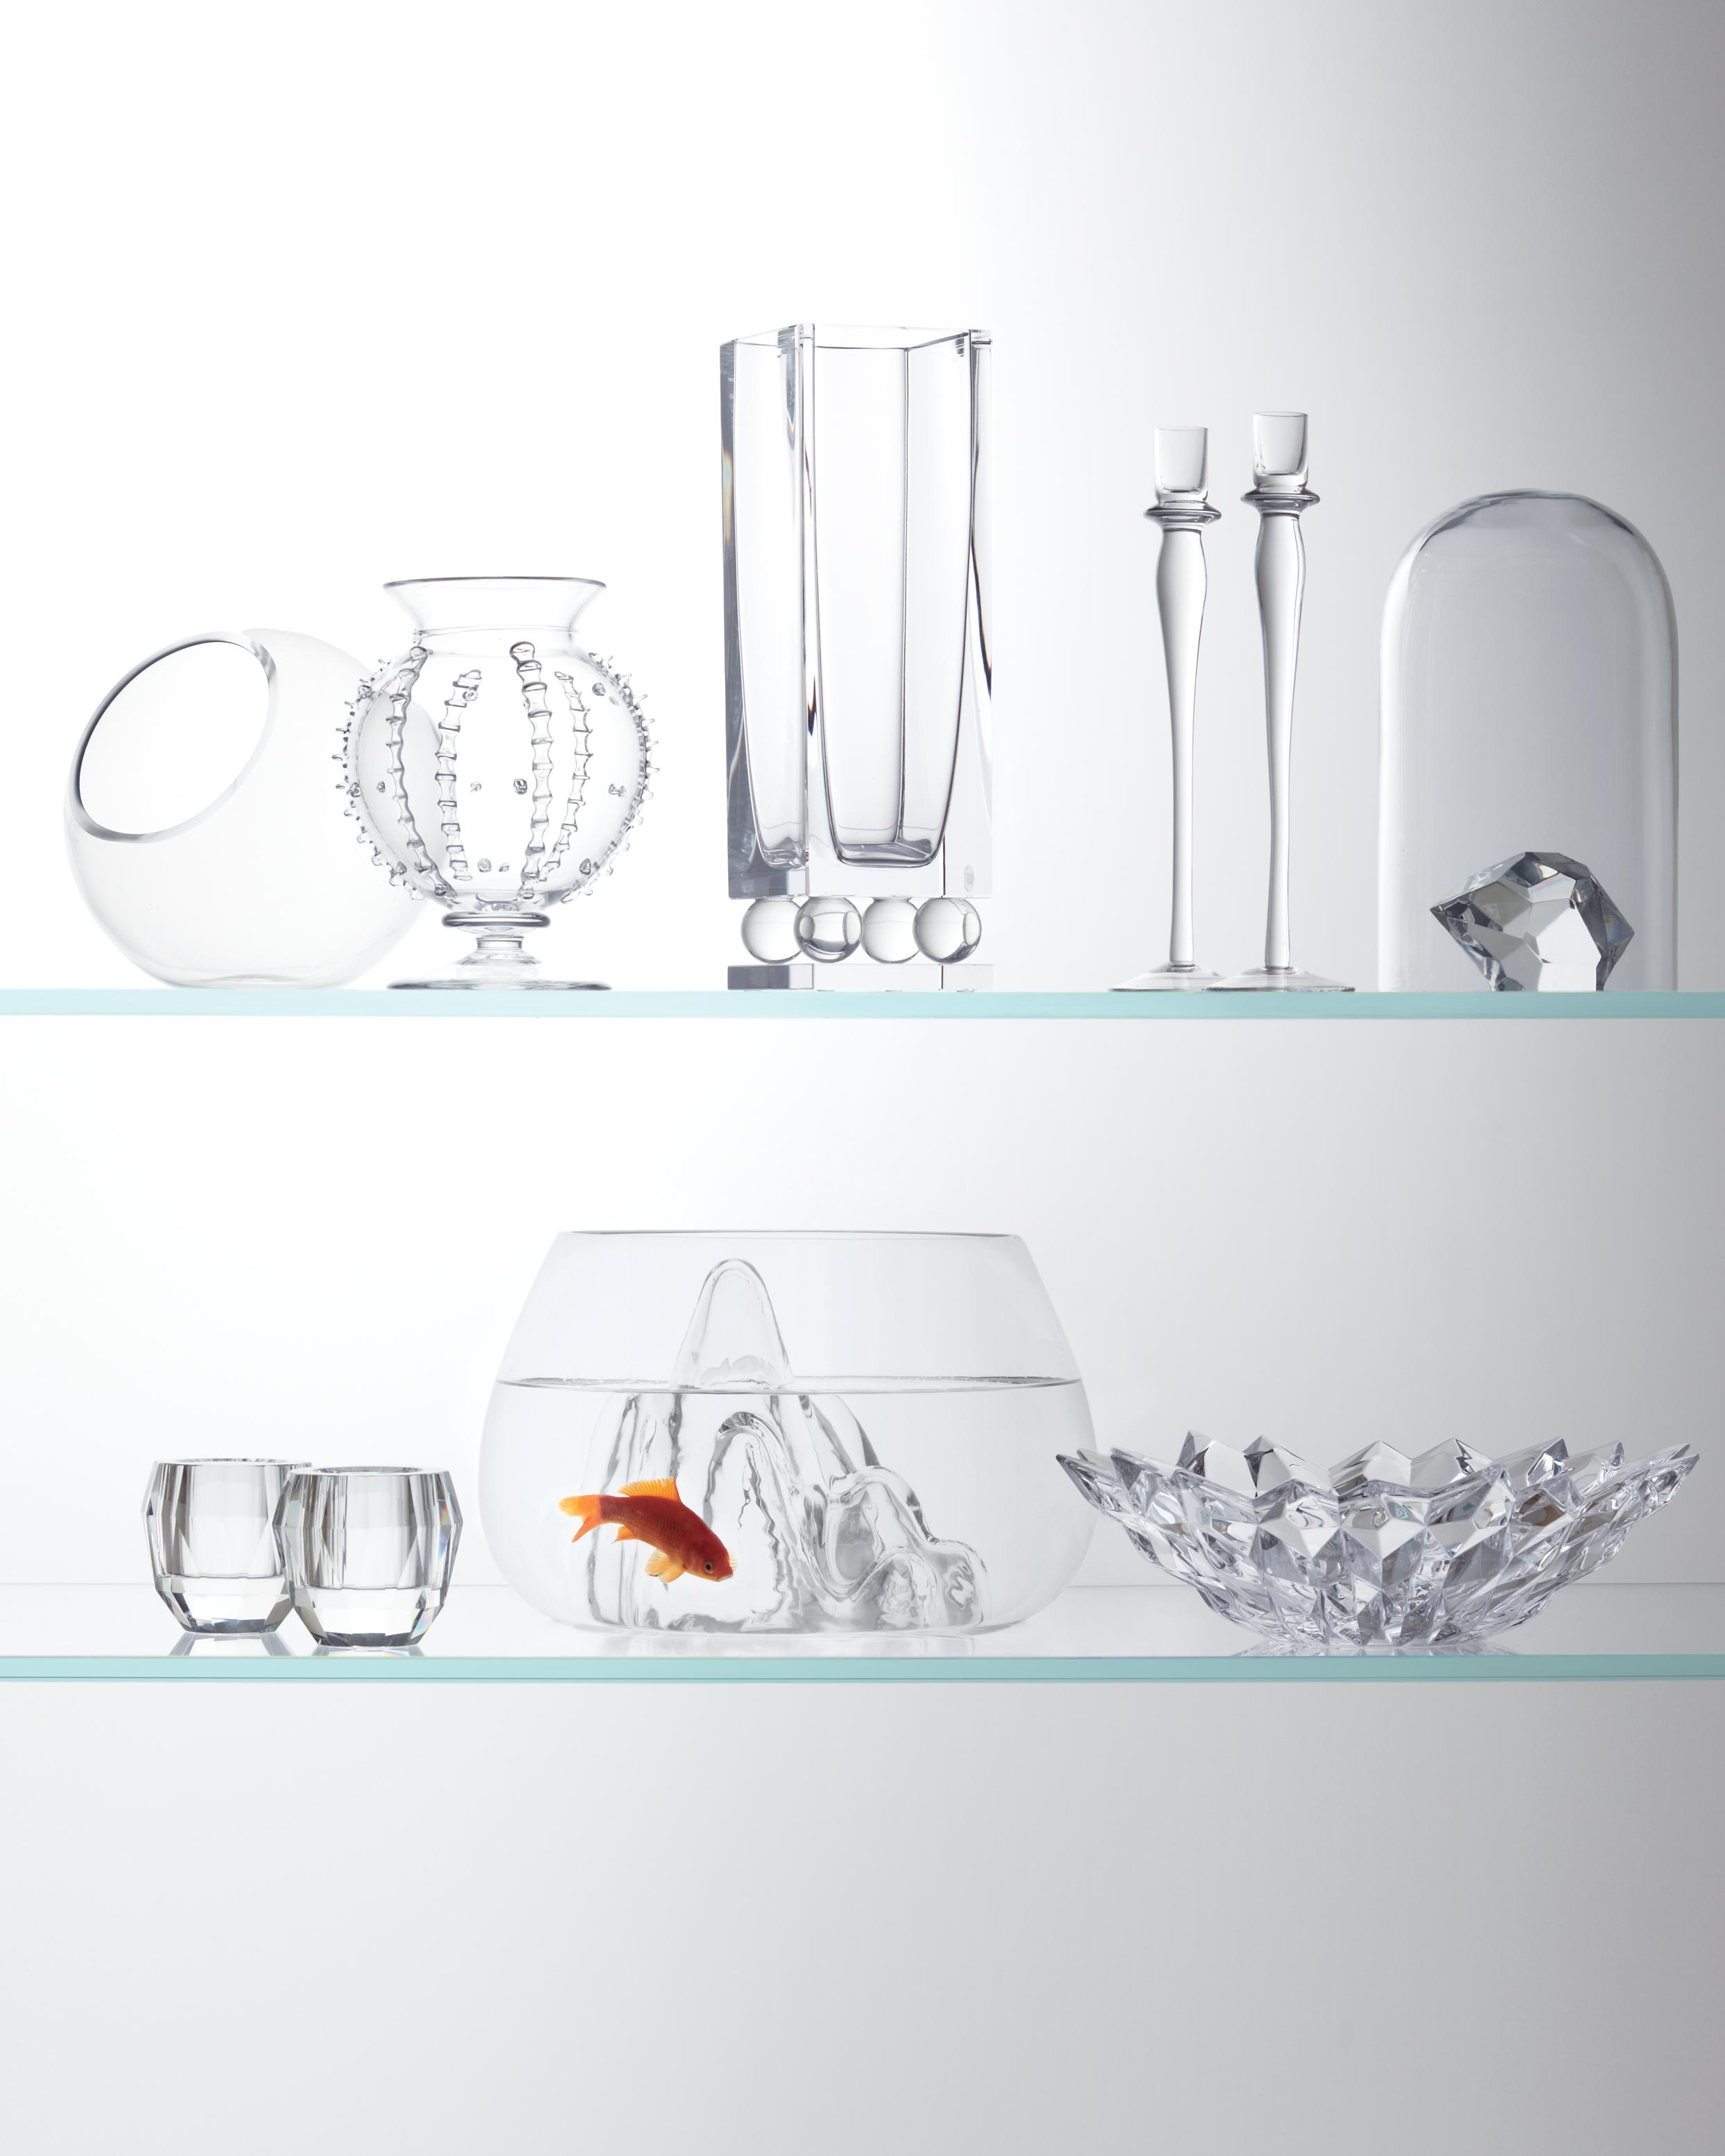 glass-decorative-2-mwd109328.jpg